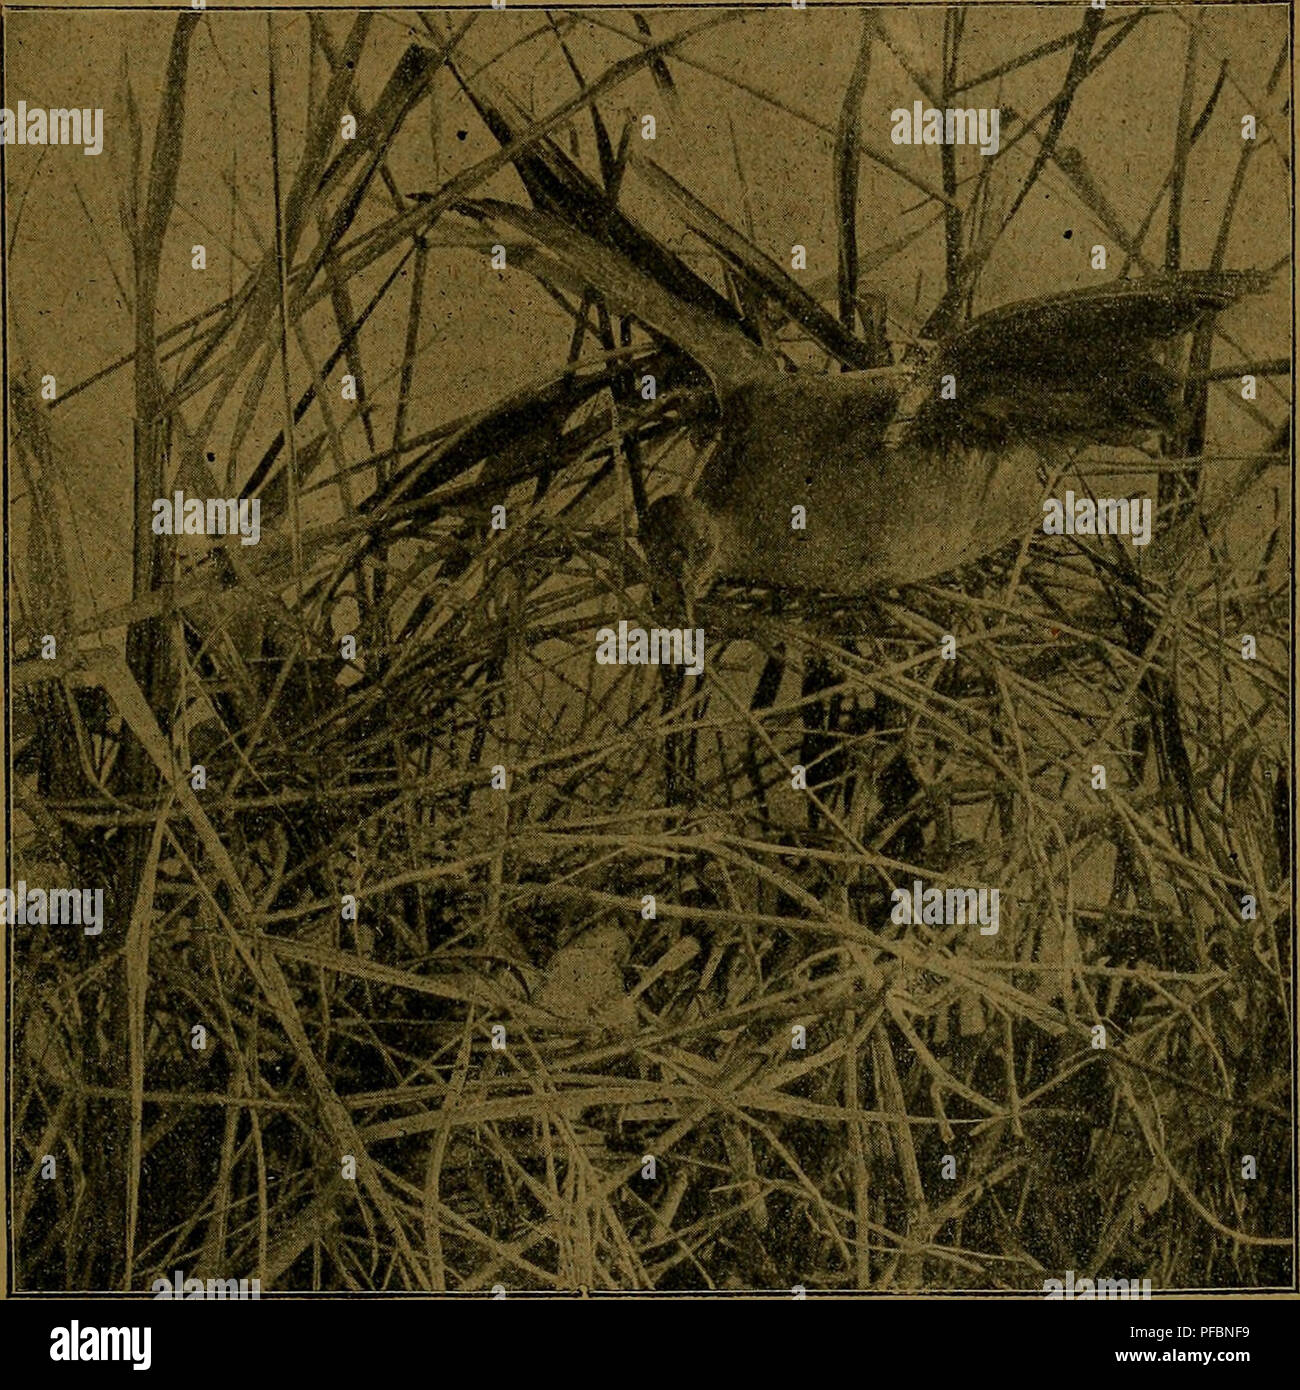 Der Ornithologische Beobachter. Lu0027ornithologie, Les Oiseaux. TT.^  .